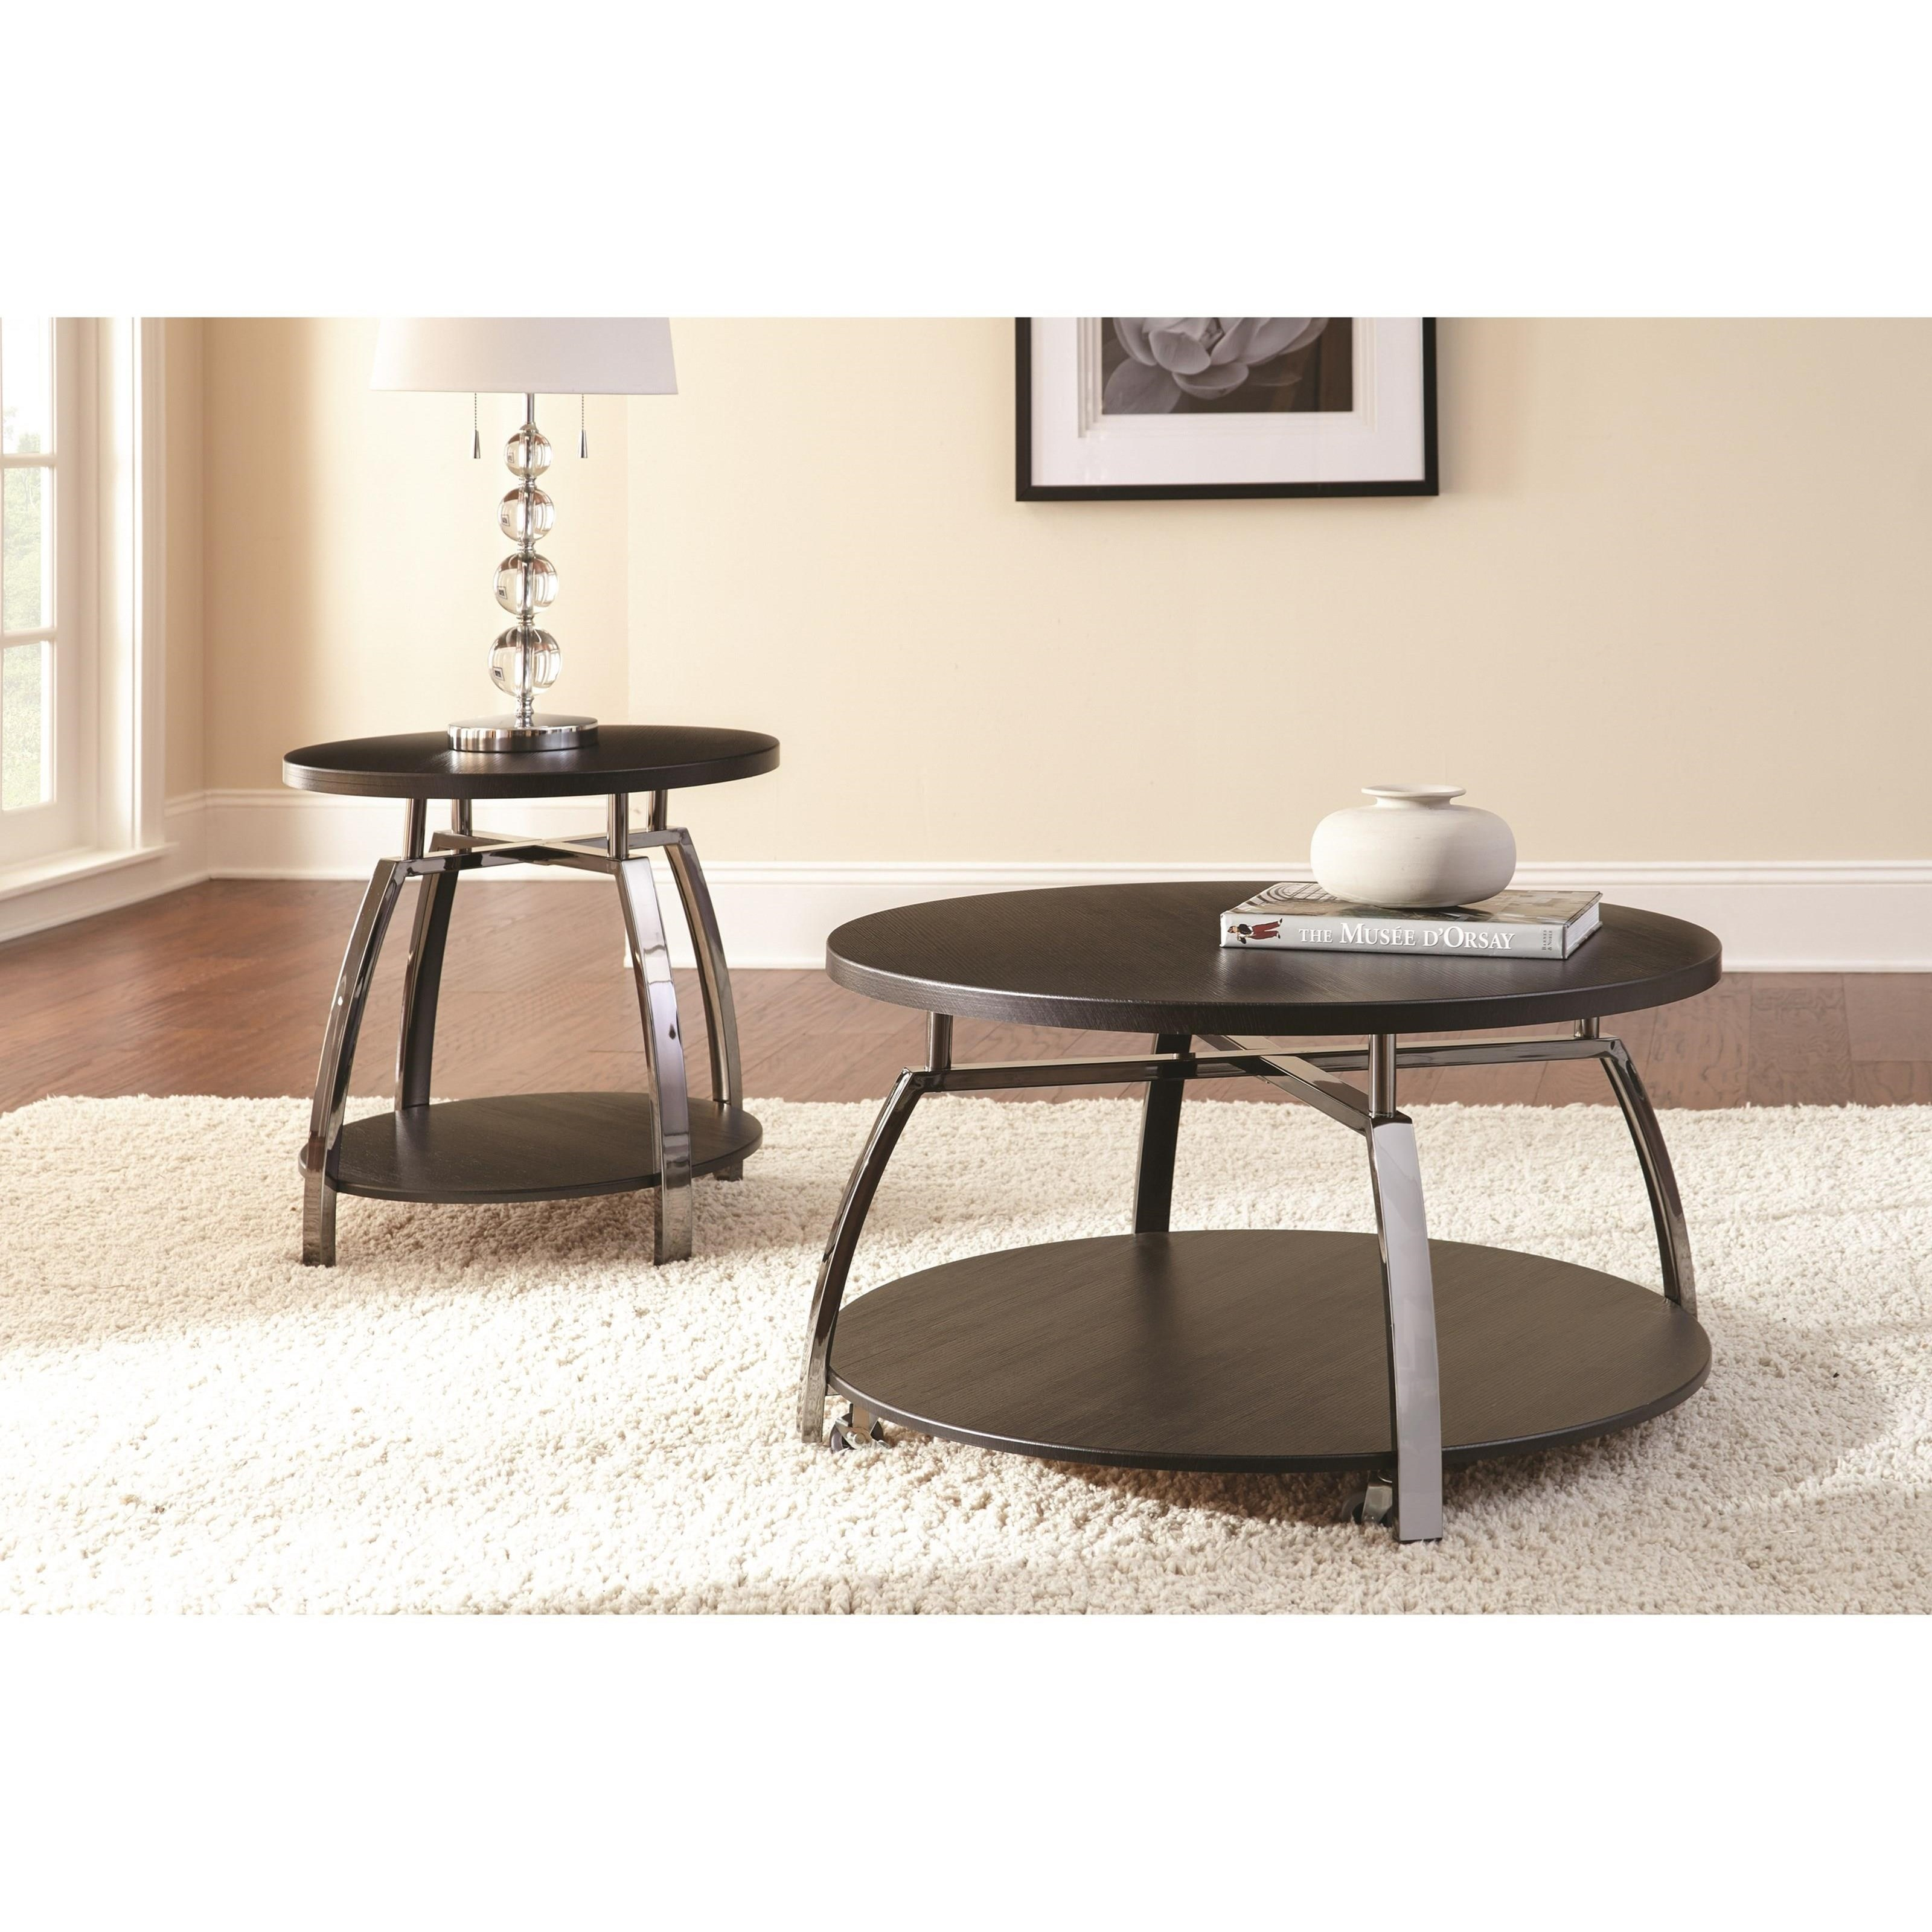 Levits Furniture: Steve Silver Coham CM150C Round Cocktail Table